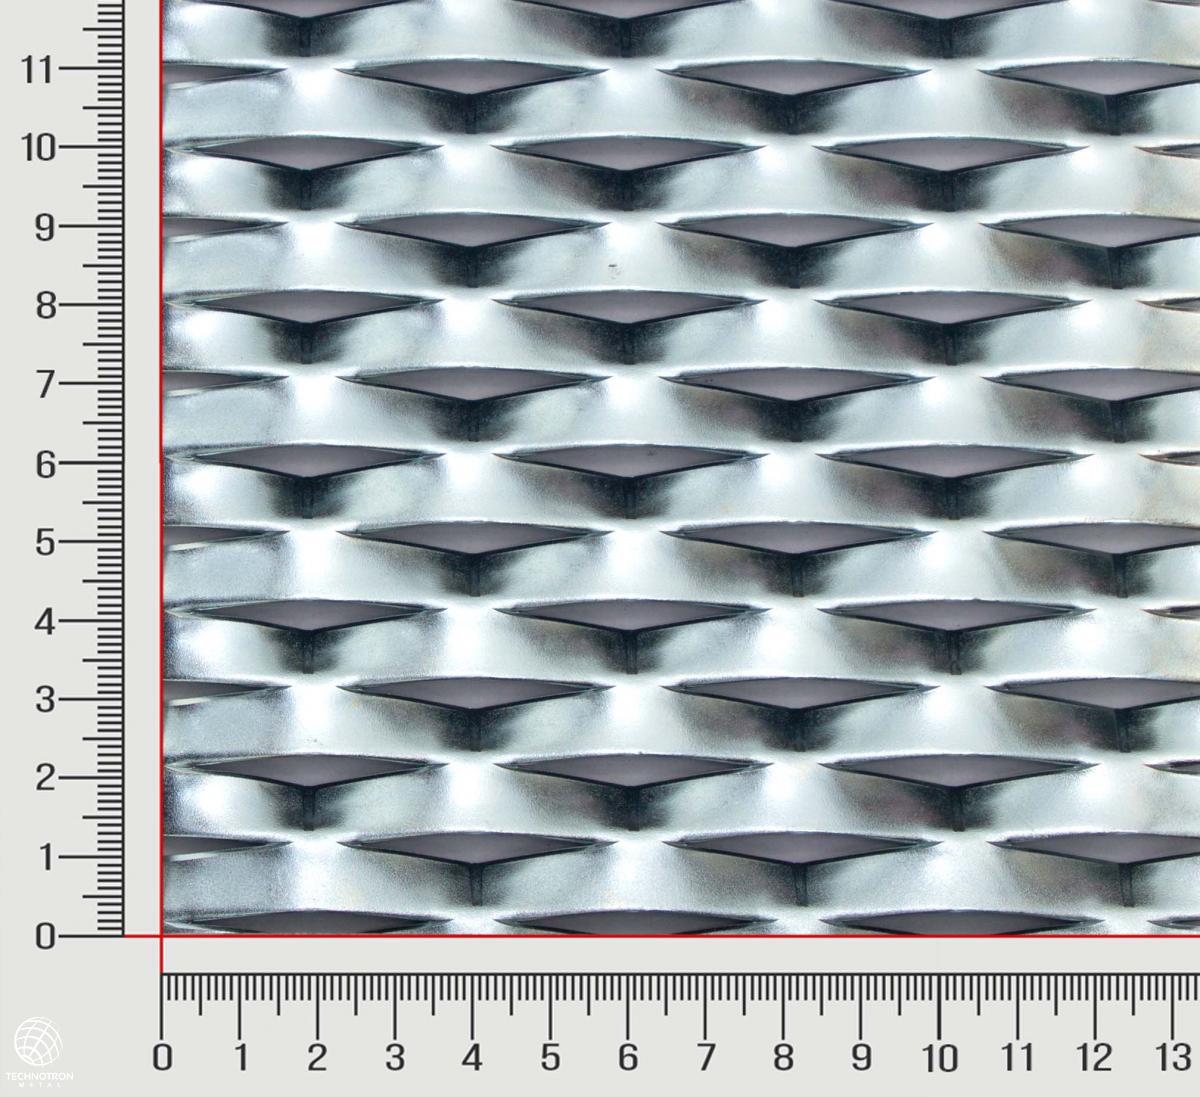 Plotová výplň Play TR 42 x 20 x 9 mm, 1,5x2000x1500 mm, tahokov z ocelového plechu DC01-DC05